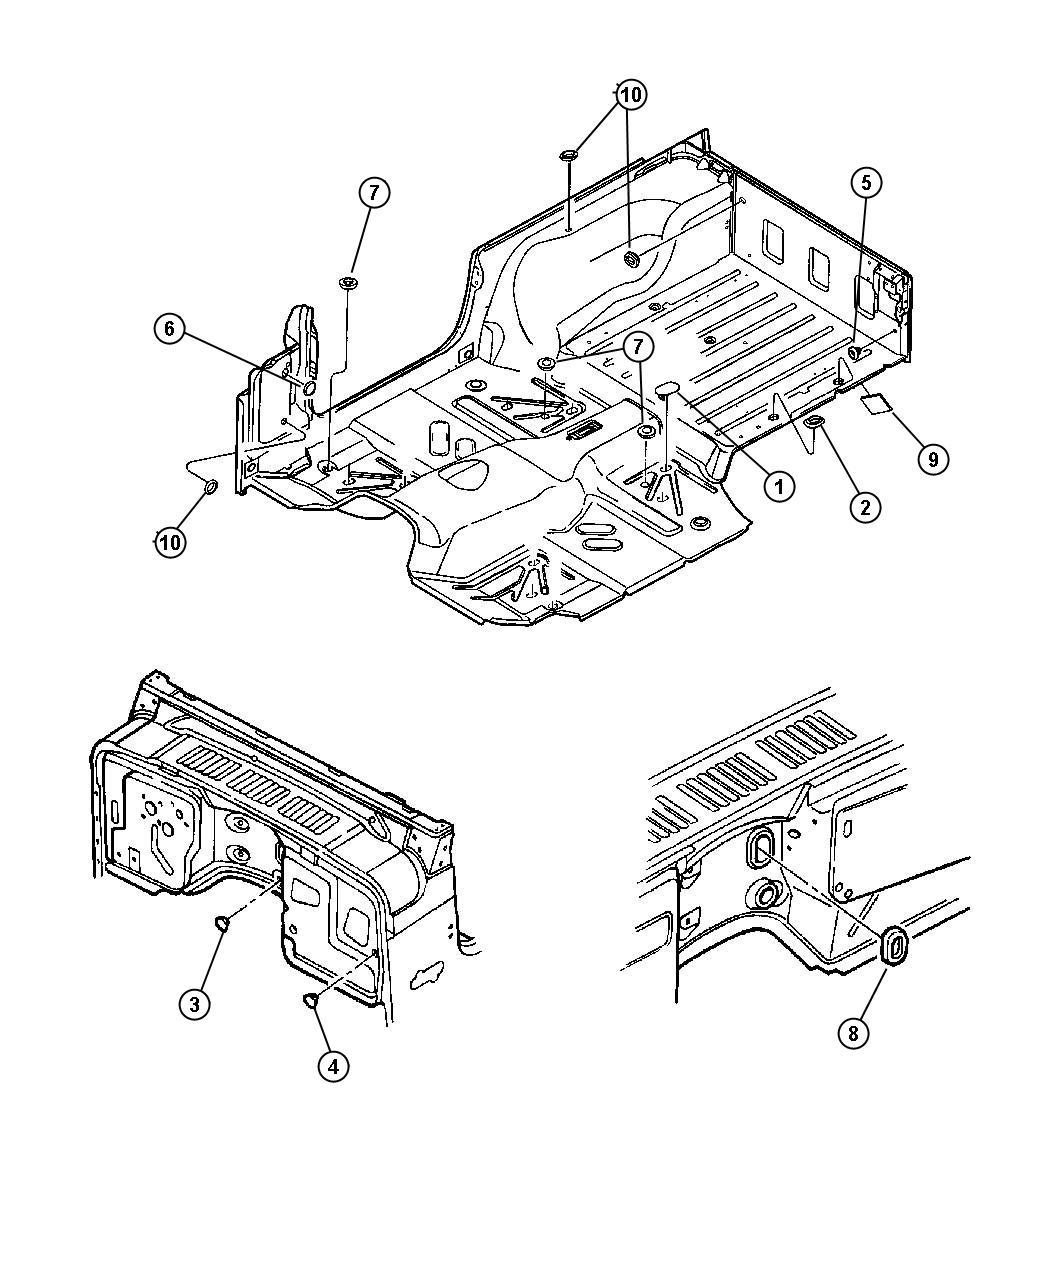 jeep wrangler plug  floor pan  rubber  liftgate  plugs  body